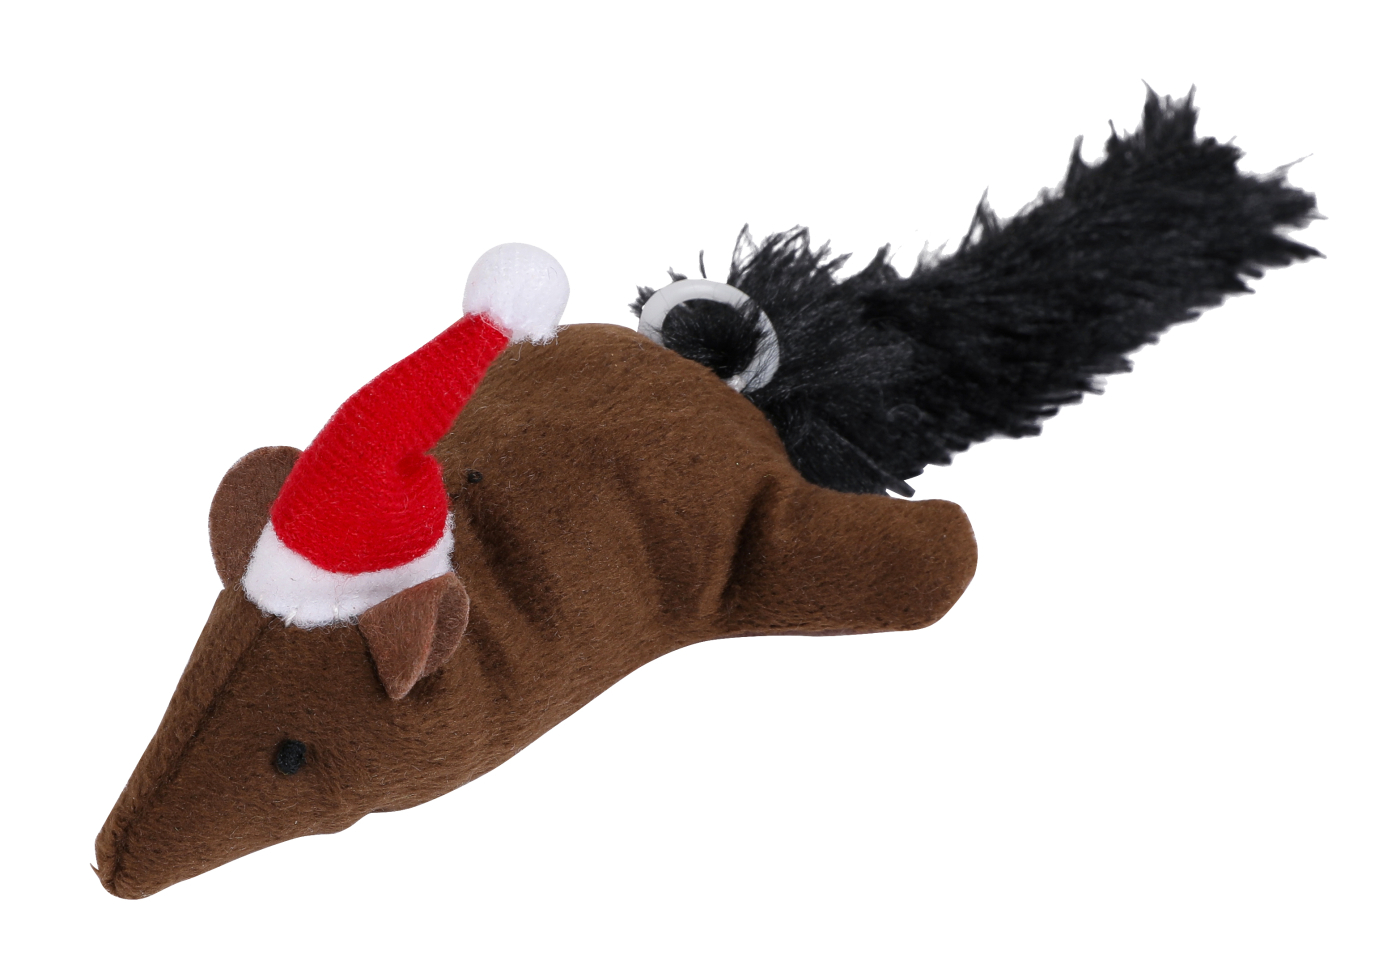 CHRISTMAS VIBRATING TOY ARDILLA